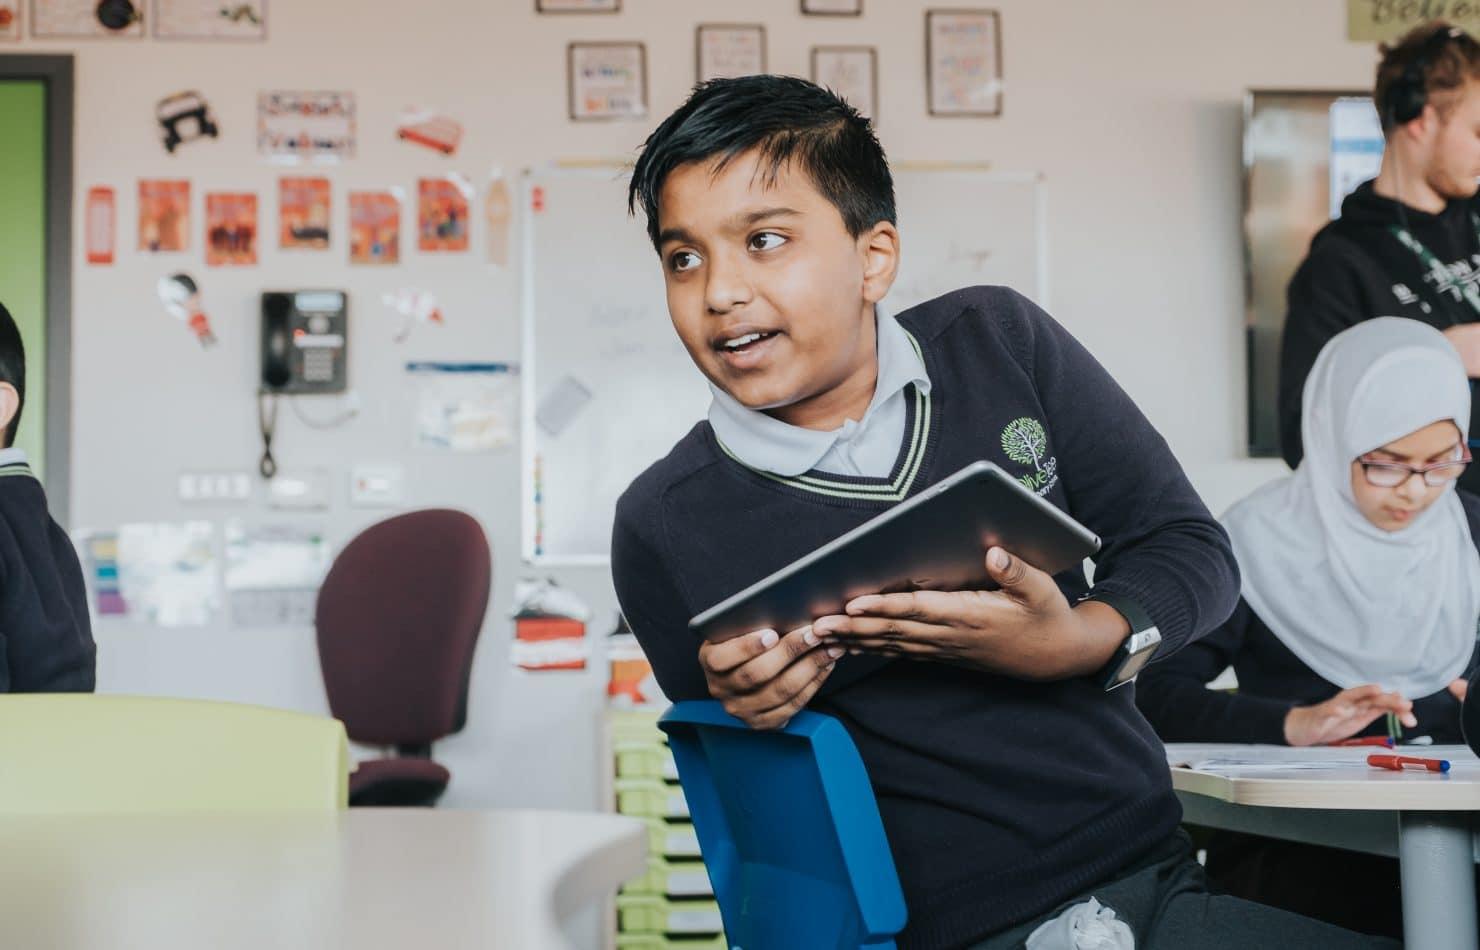 Child enjoying EdTech